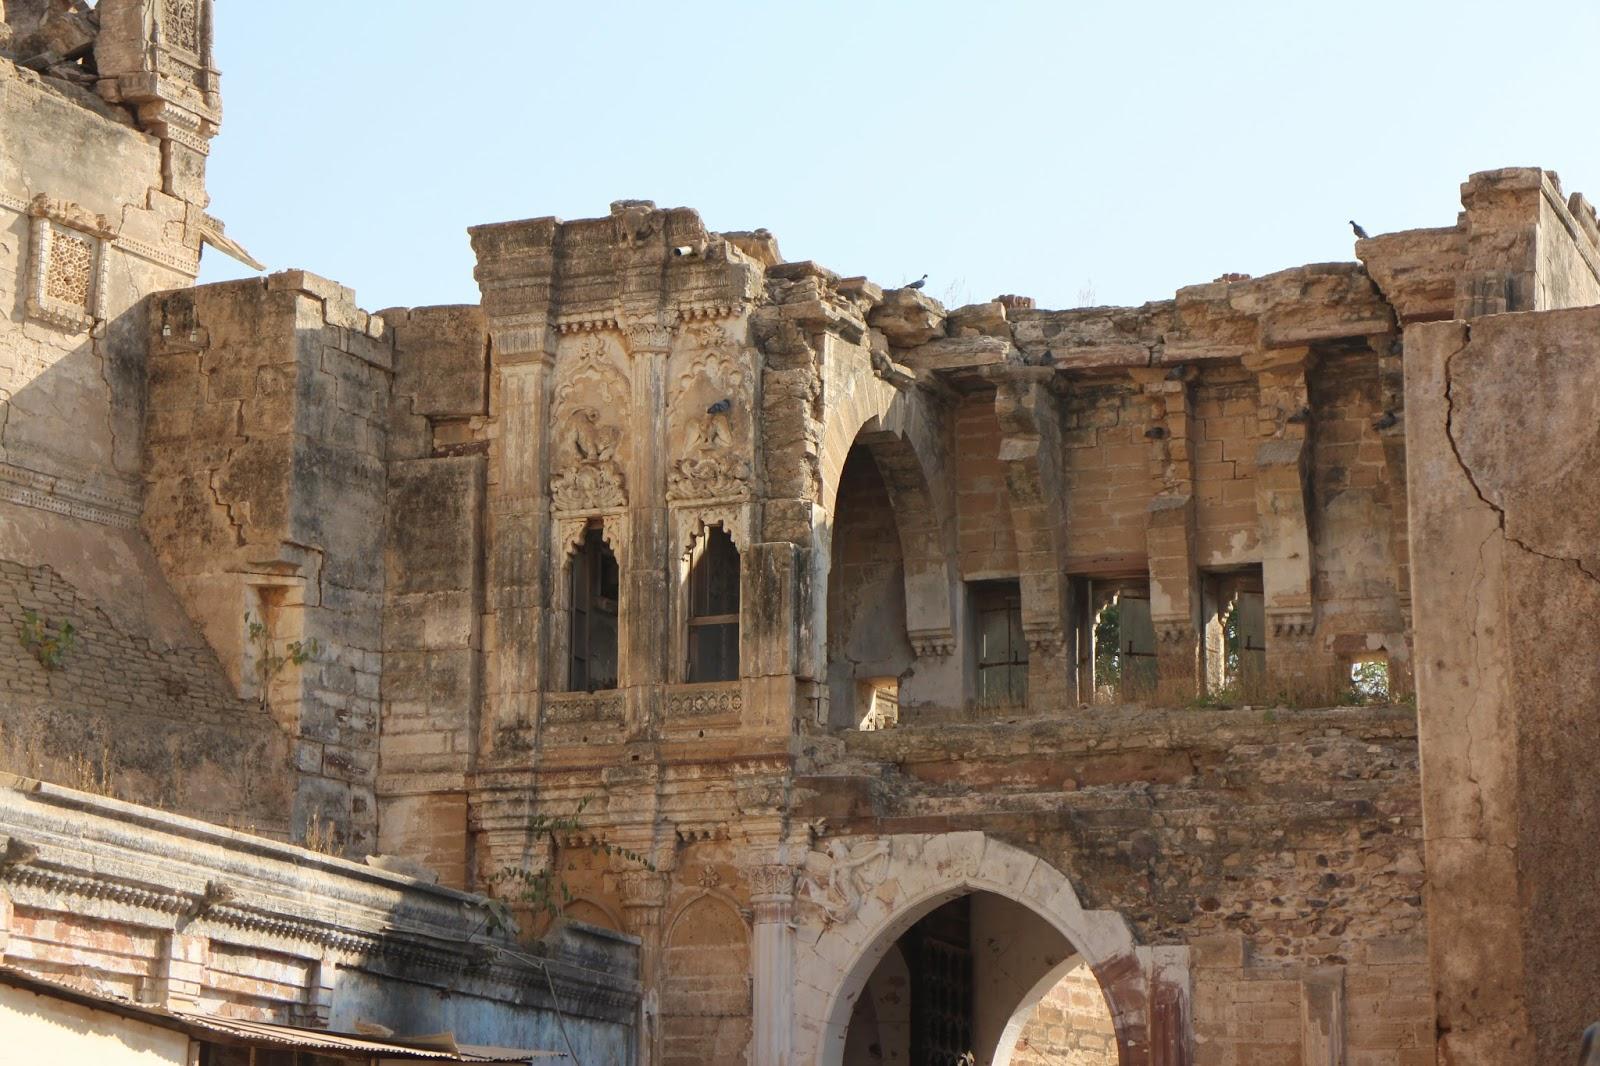 Bhuj, Kutch, Gujarat, Gujarat Tourism, Bhuj Fort, Rani ka Khas